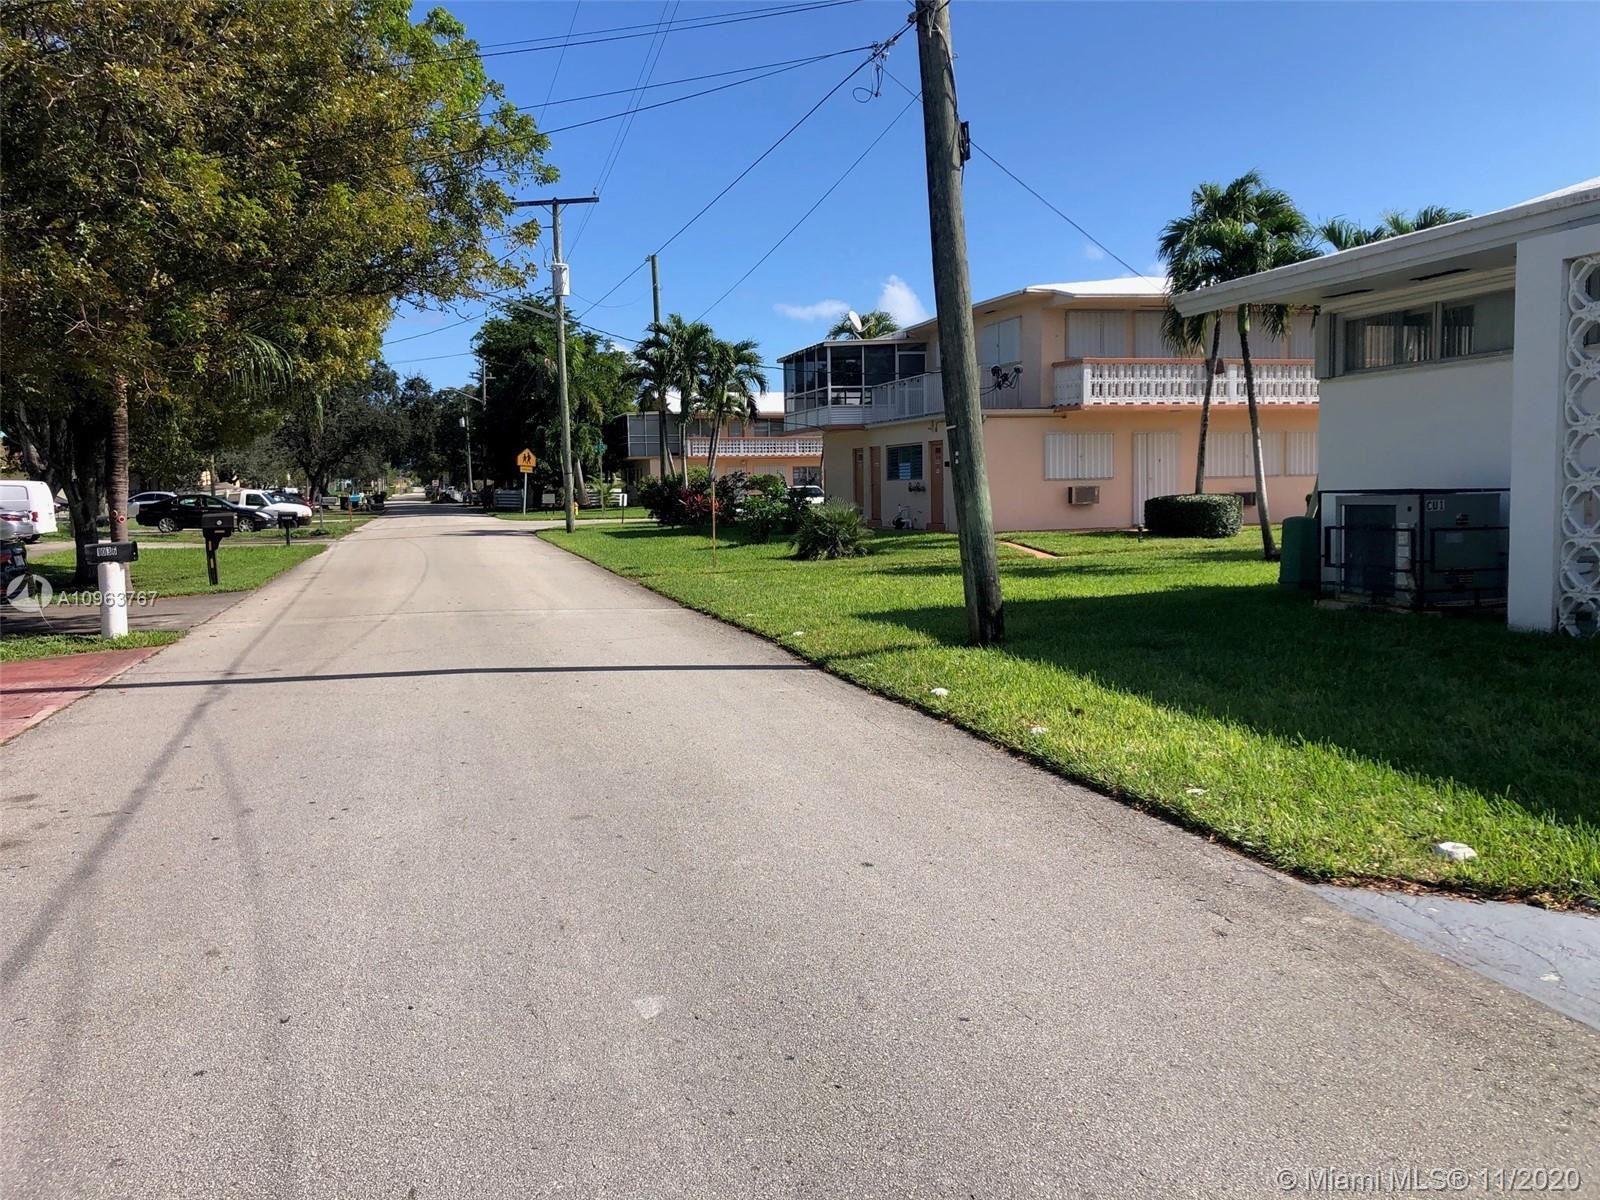 Photo of 1036 SW 8th St, Hallandale Beach, FL 33009 (MLS # A10963767)